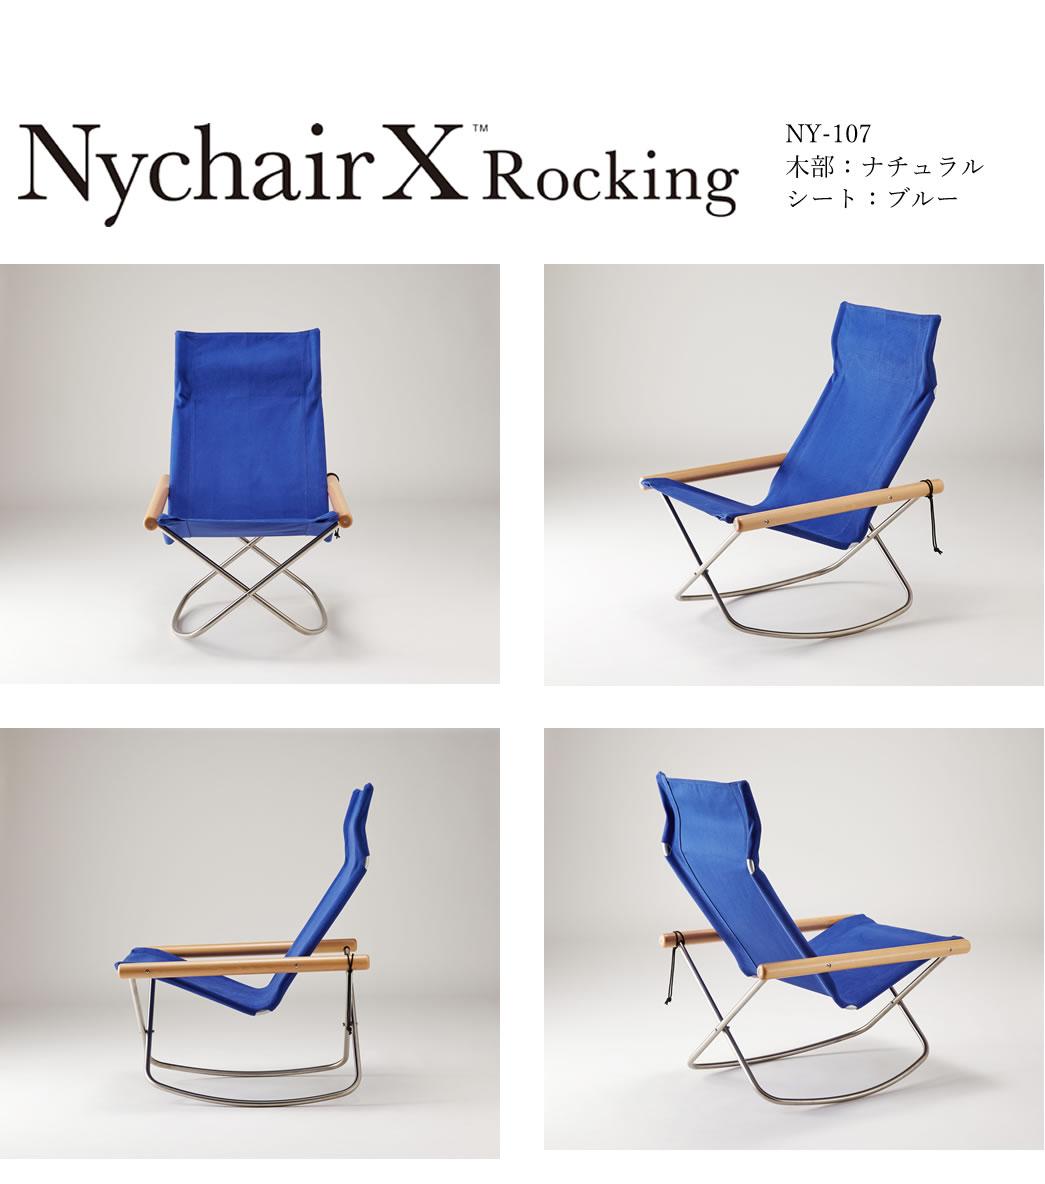 NY-107 NychairX rocking ニーチェアエックス ロッキング 木部:ナチュラル/シート:ブルー